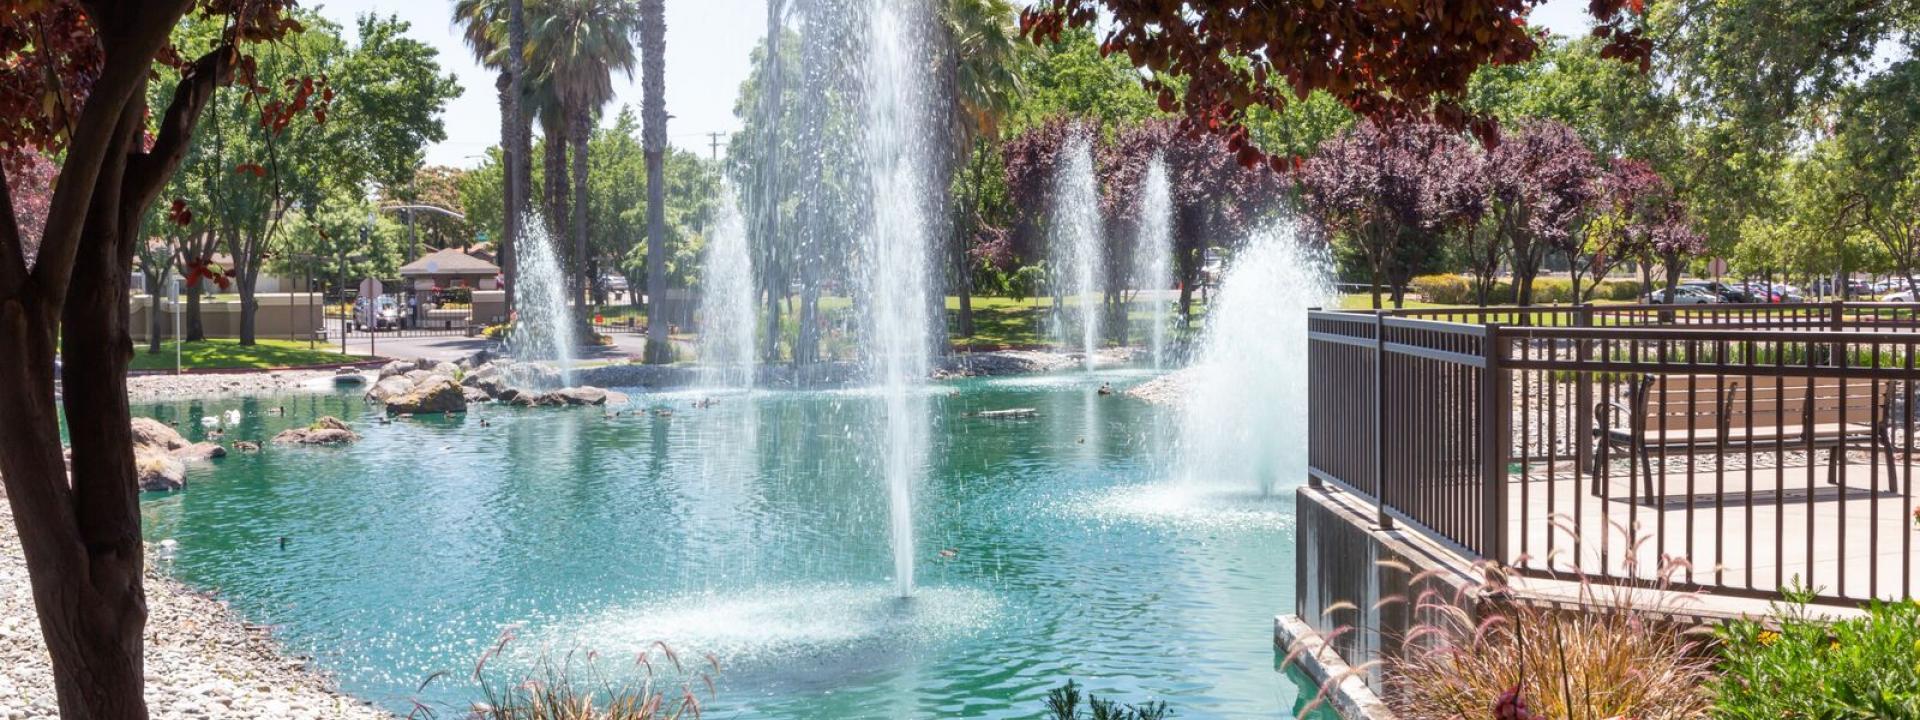 Continuing Care Retirement Community CCRC Sacramento - Beautiful Eskaton Village Carmichael with pond, fountains, and outdoor deck